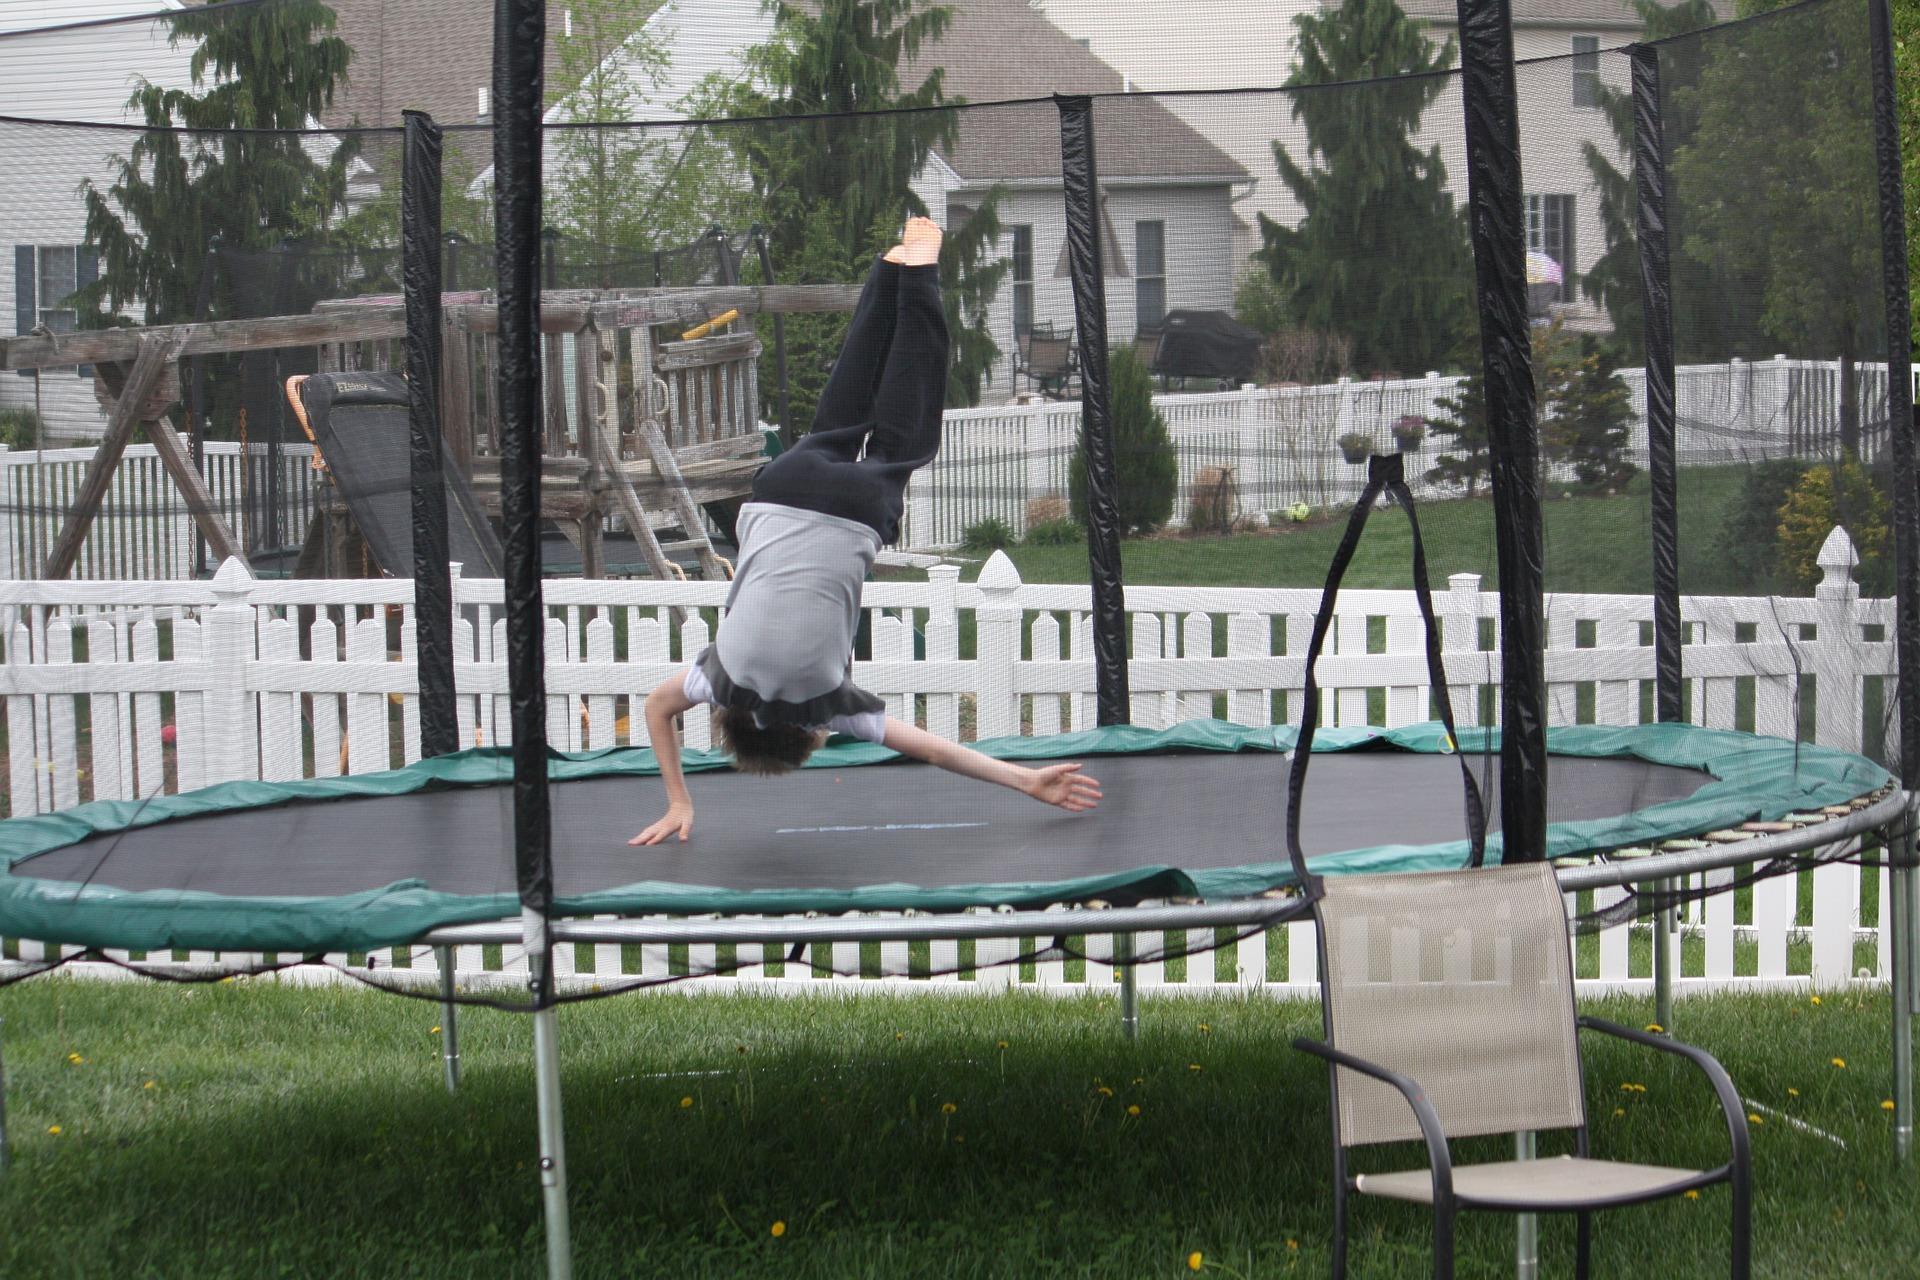 trampoline-1157867_1920